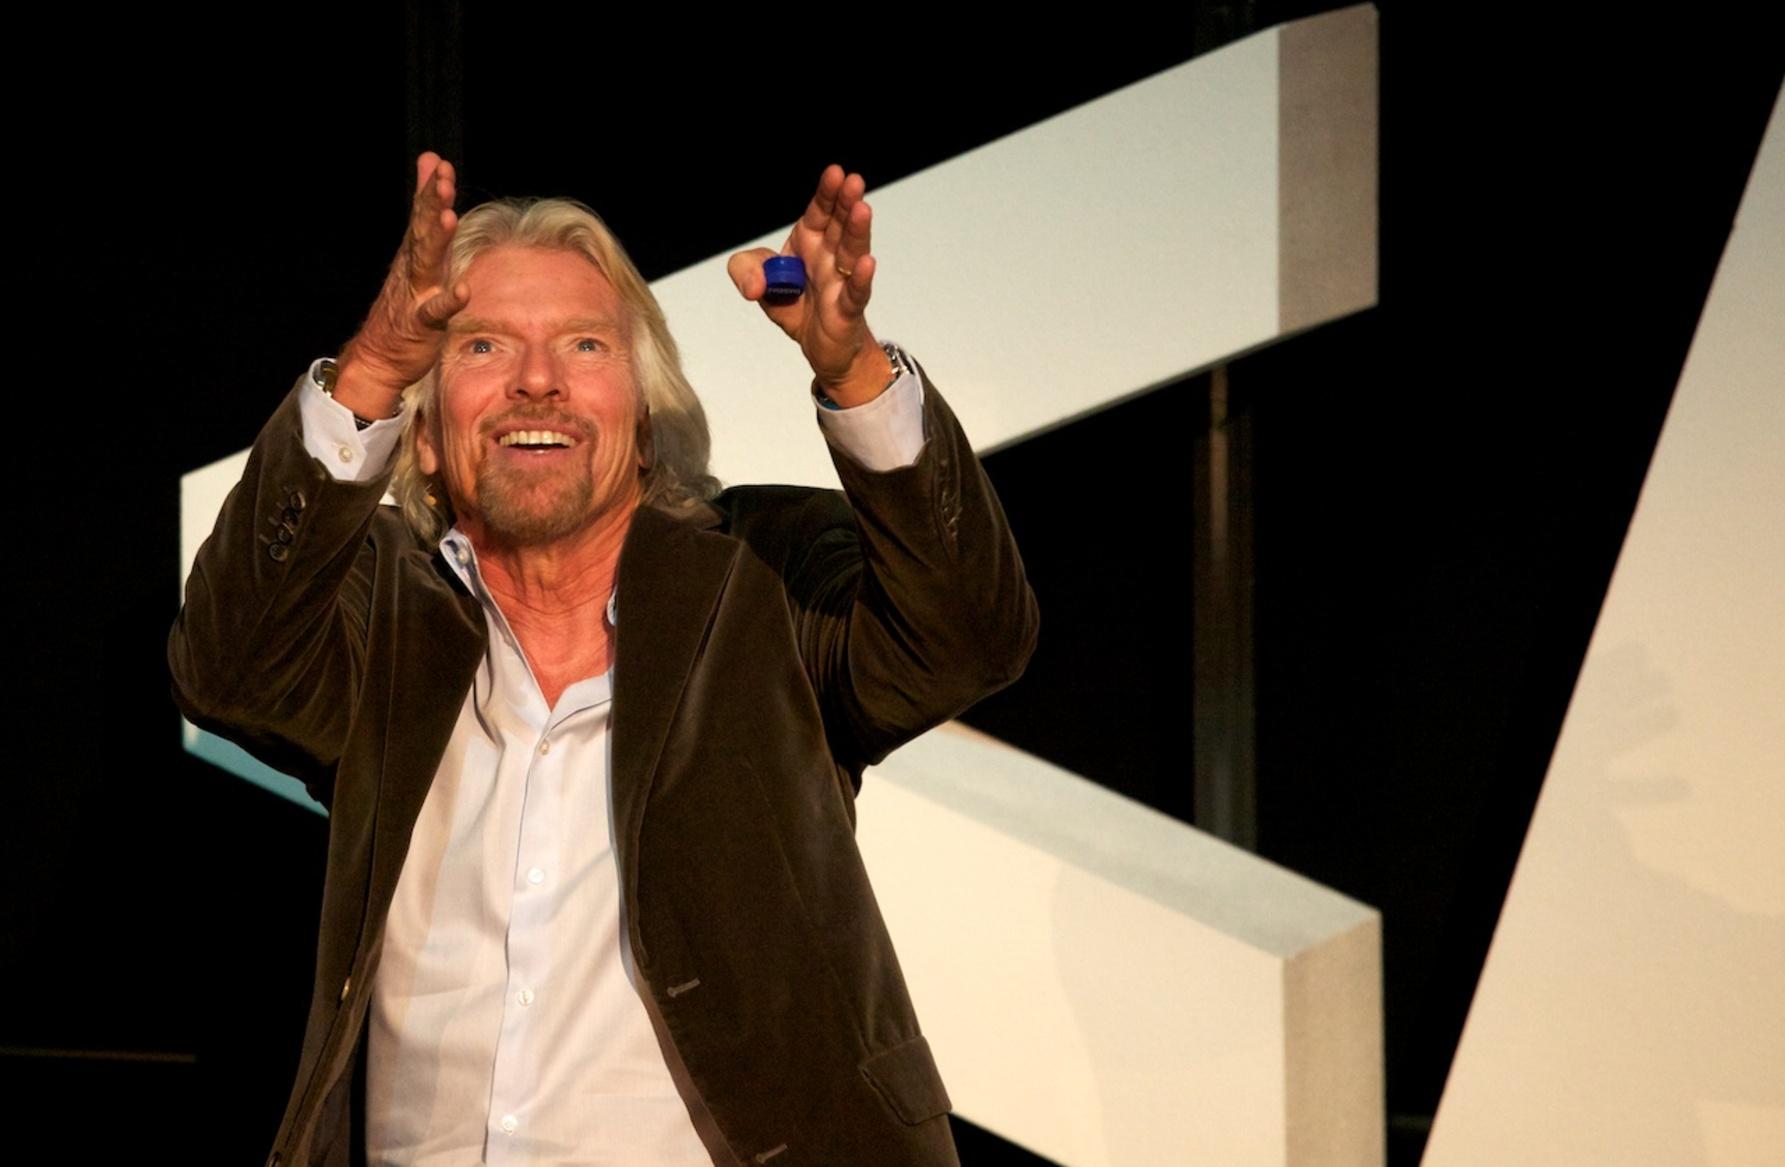 Richard Branson for Virgin Galactic